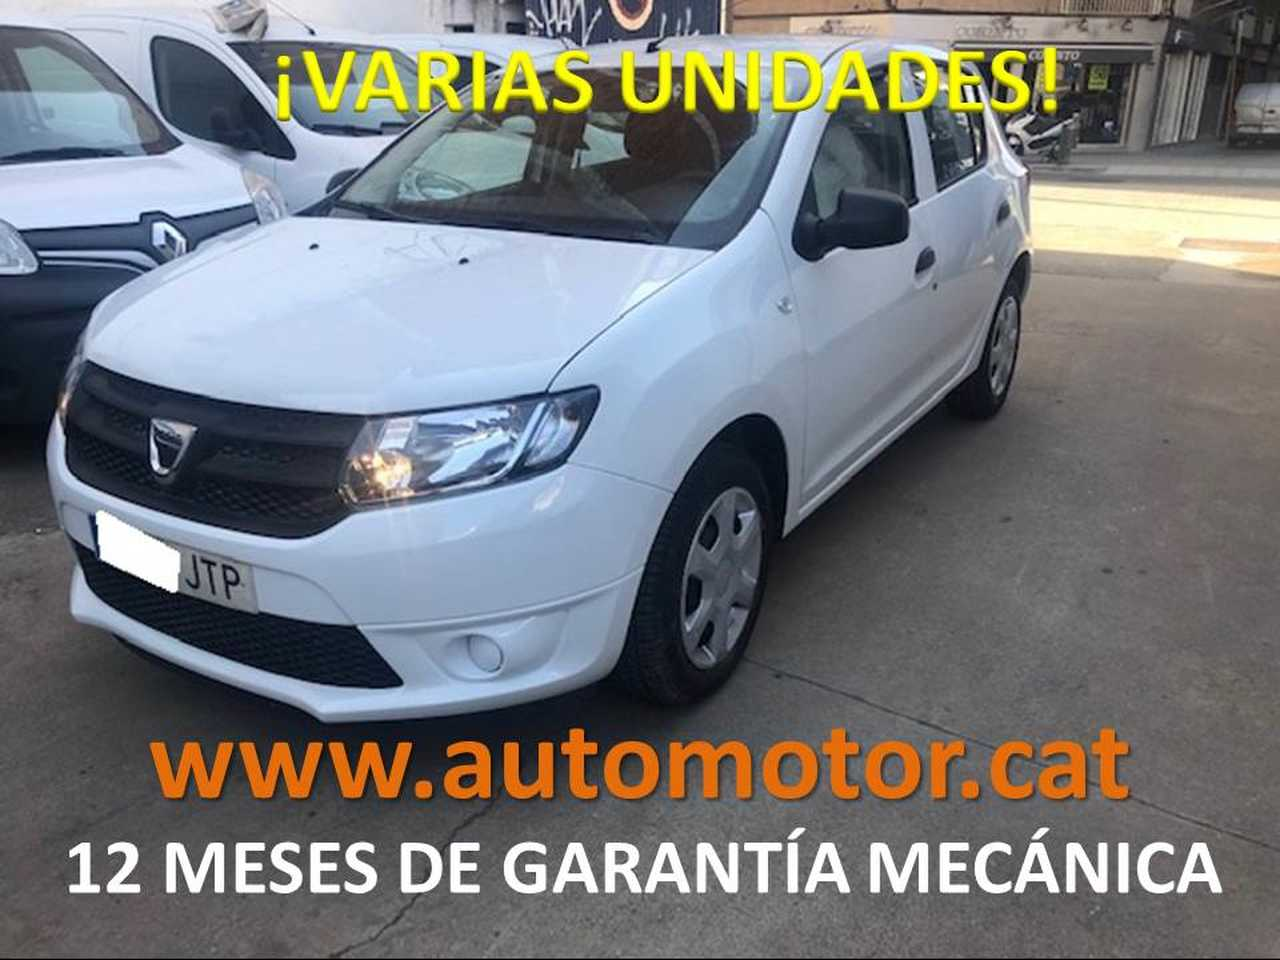 Dacia Sandero 1.5dCi Ambiance - GARANTIA MECANICA  - Foto 1